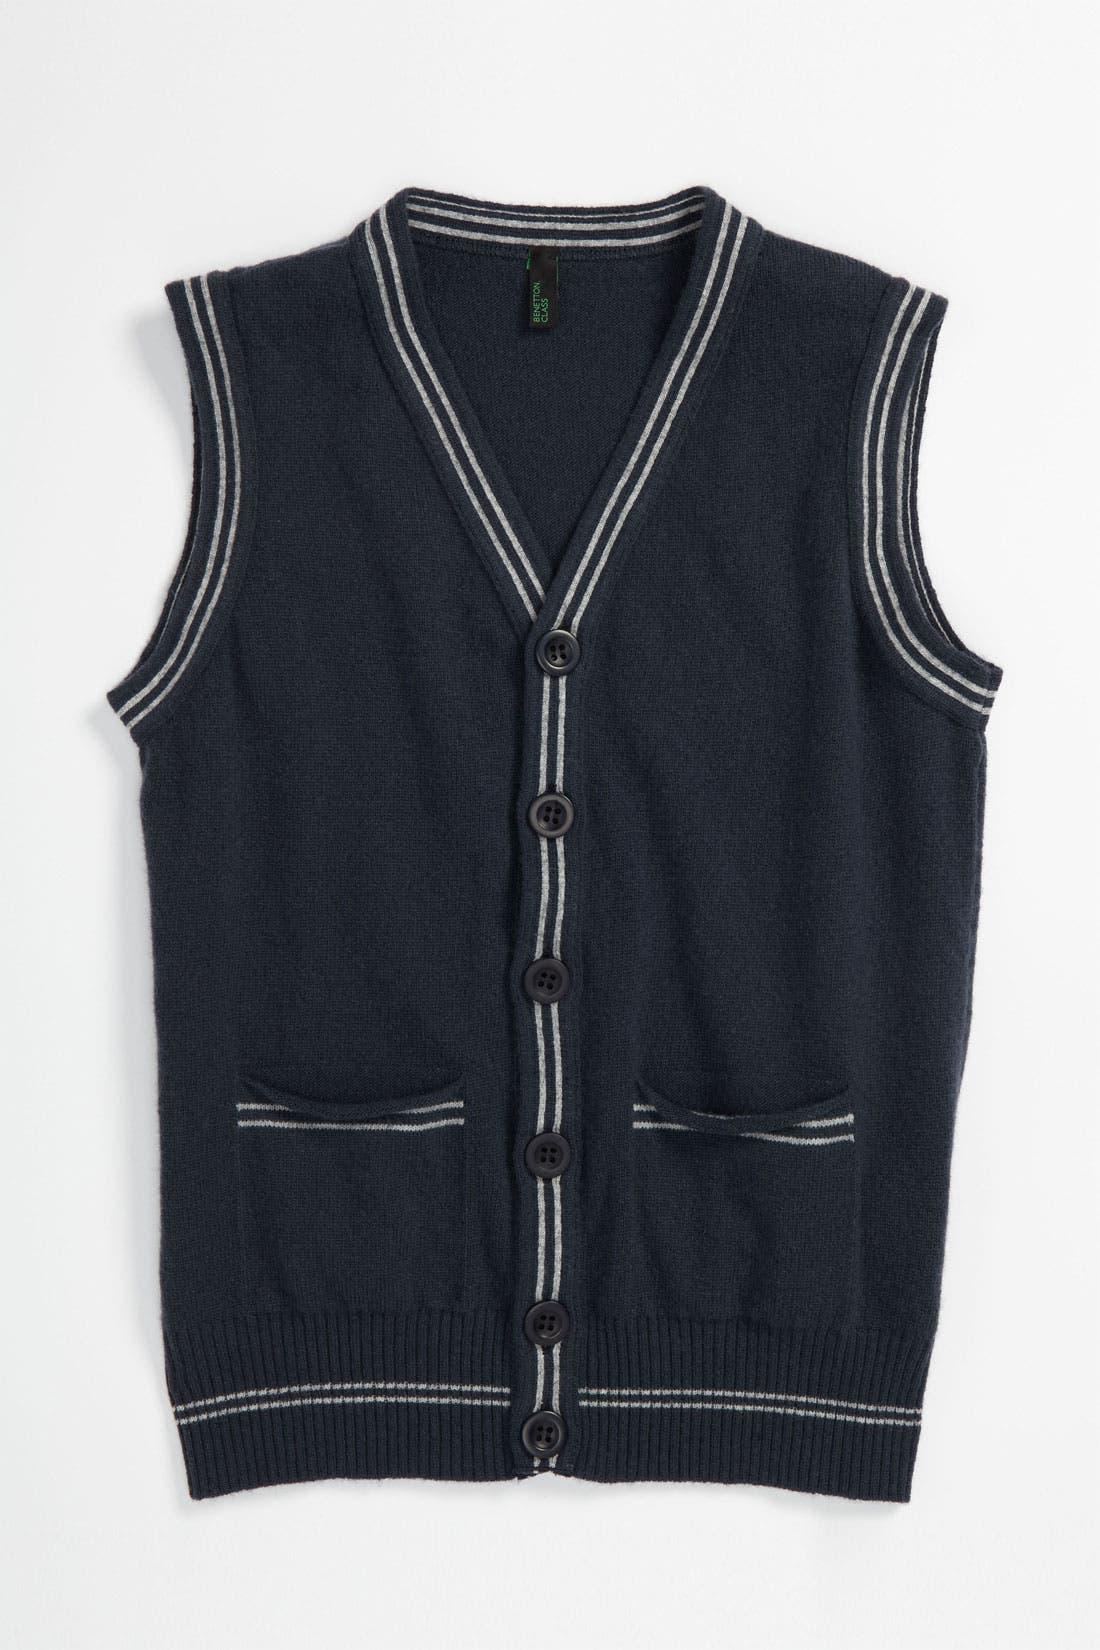 Alternate Image 1 Selected - United Colors of Benetton Kids Sweater Vest (Little Boys & Big Boys)